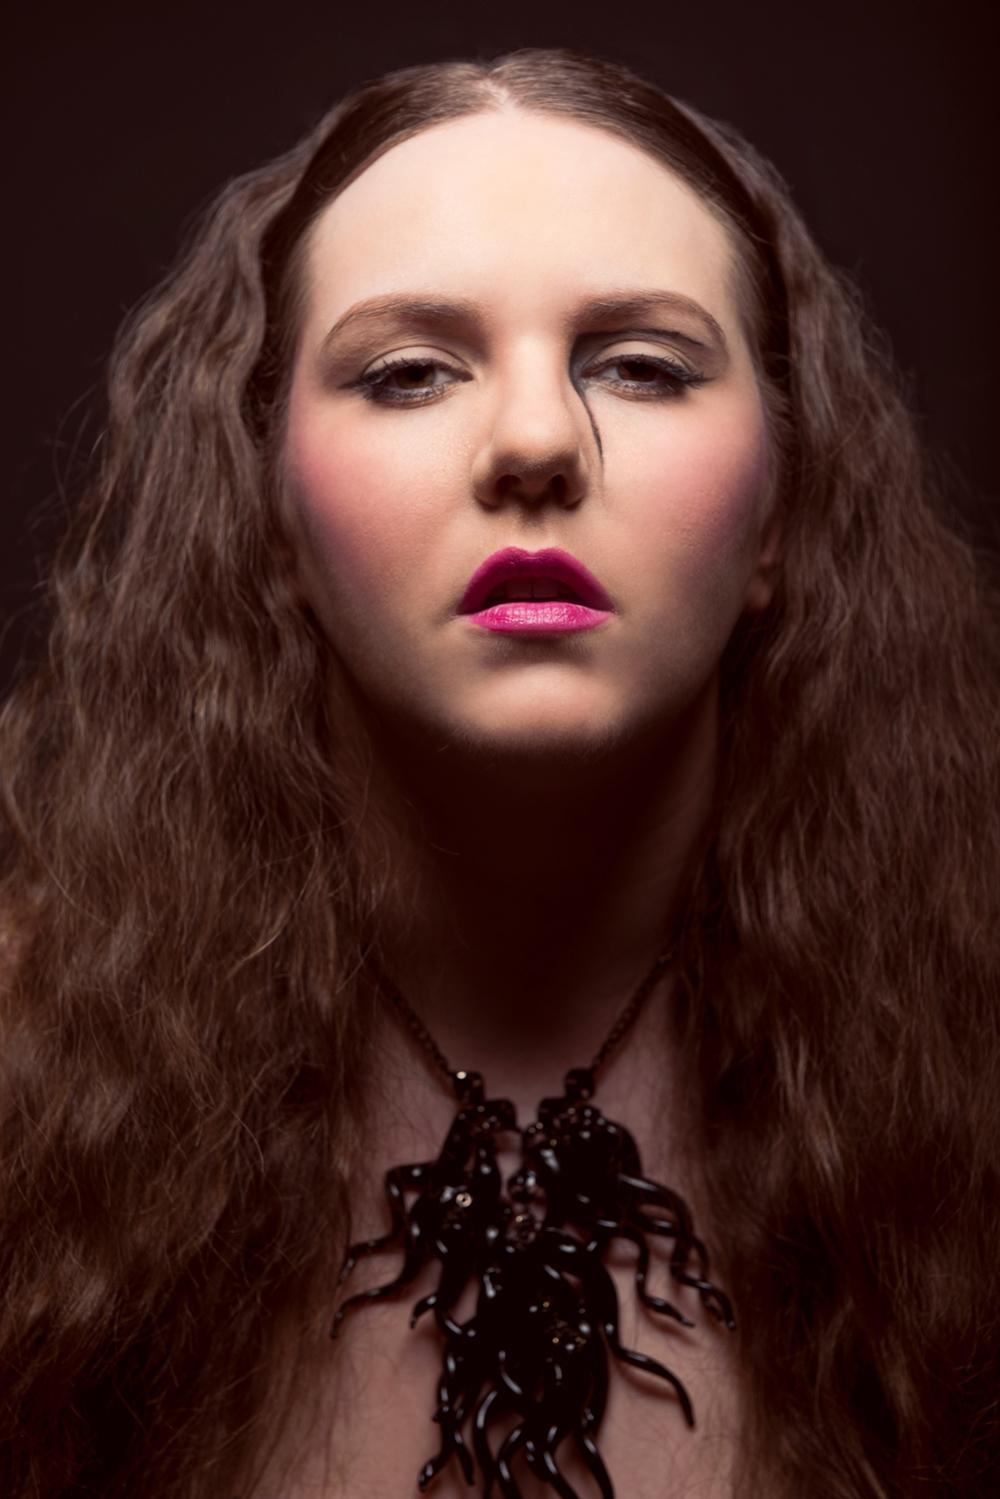 portland-photoshoot-makeup-1.jpg